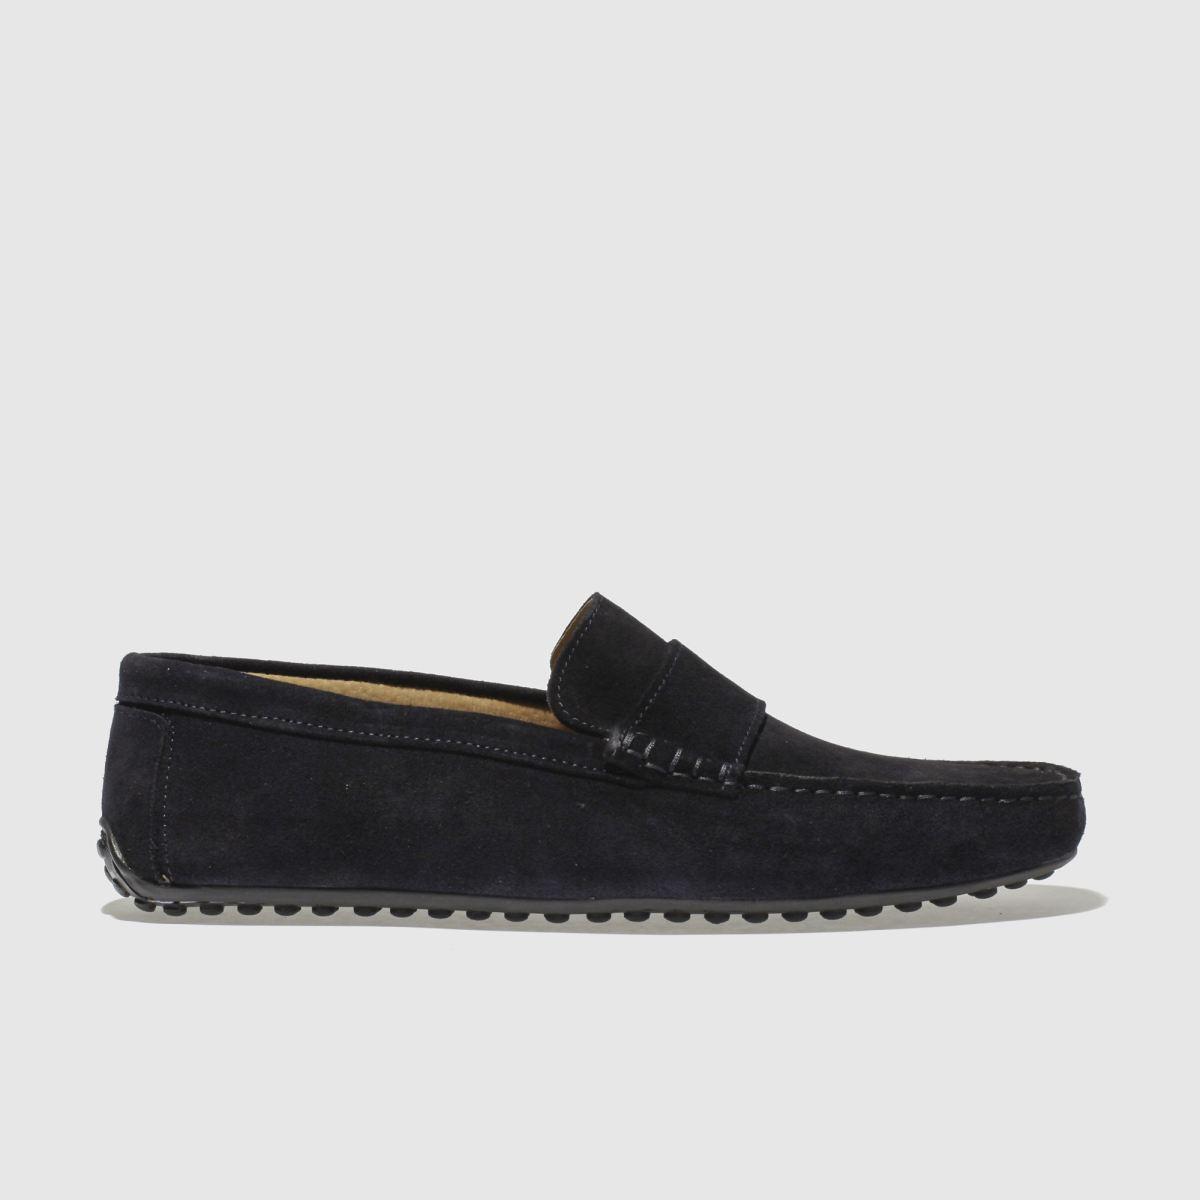 Schuh Navy Mario Driver Shoes